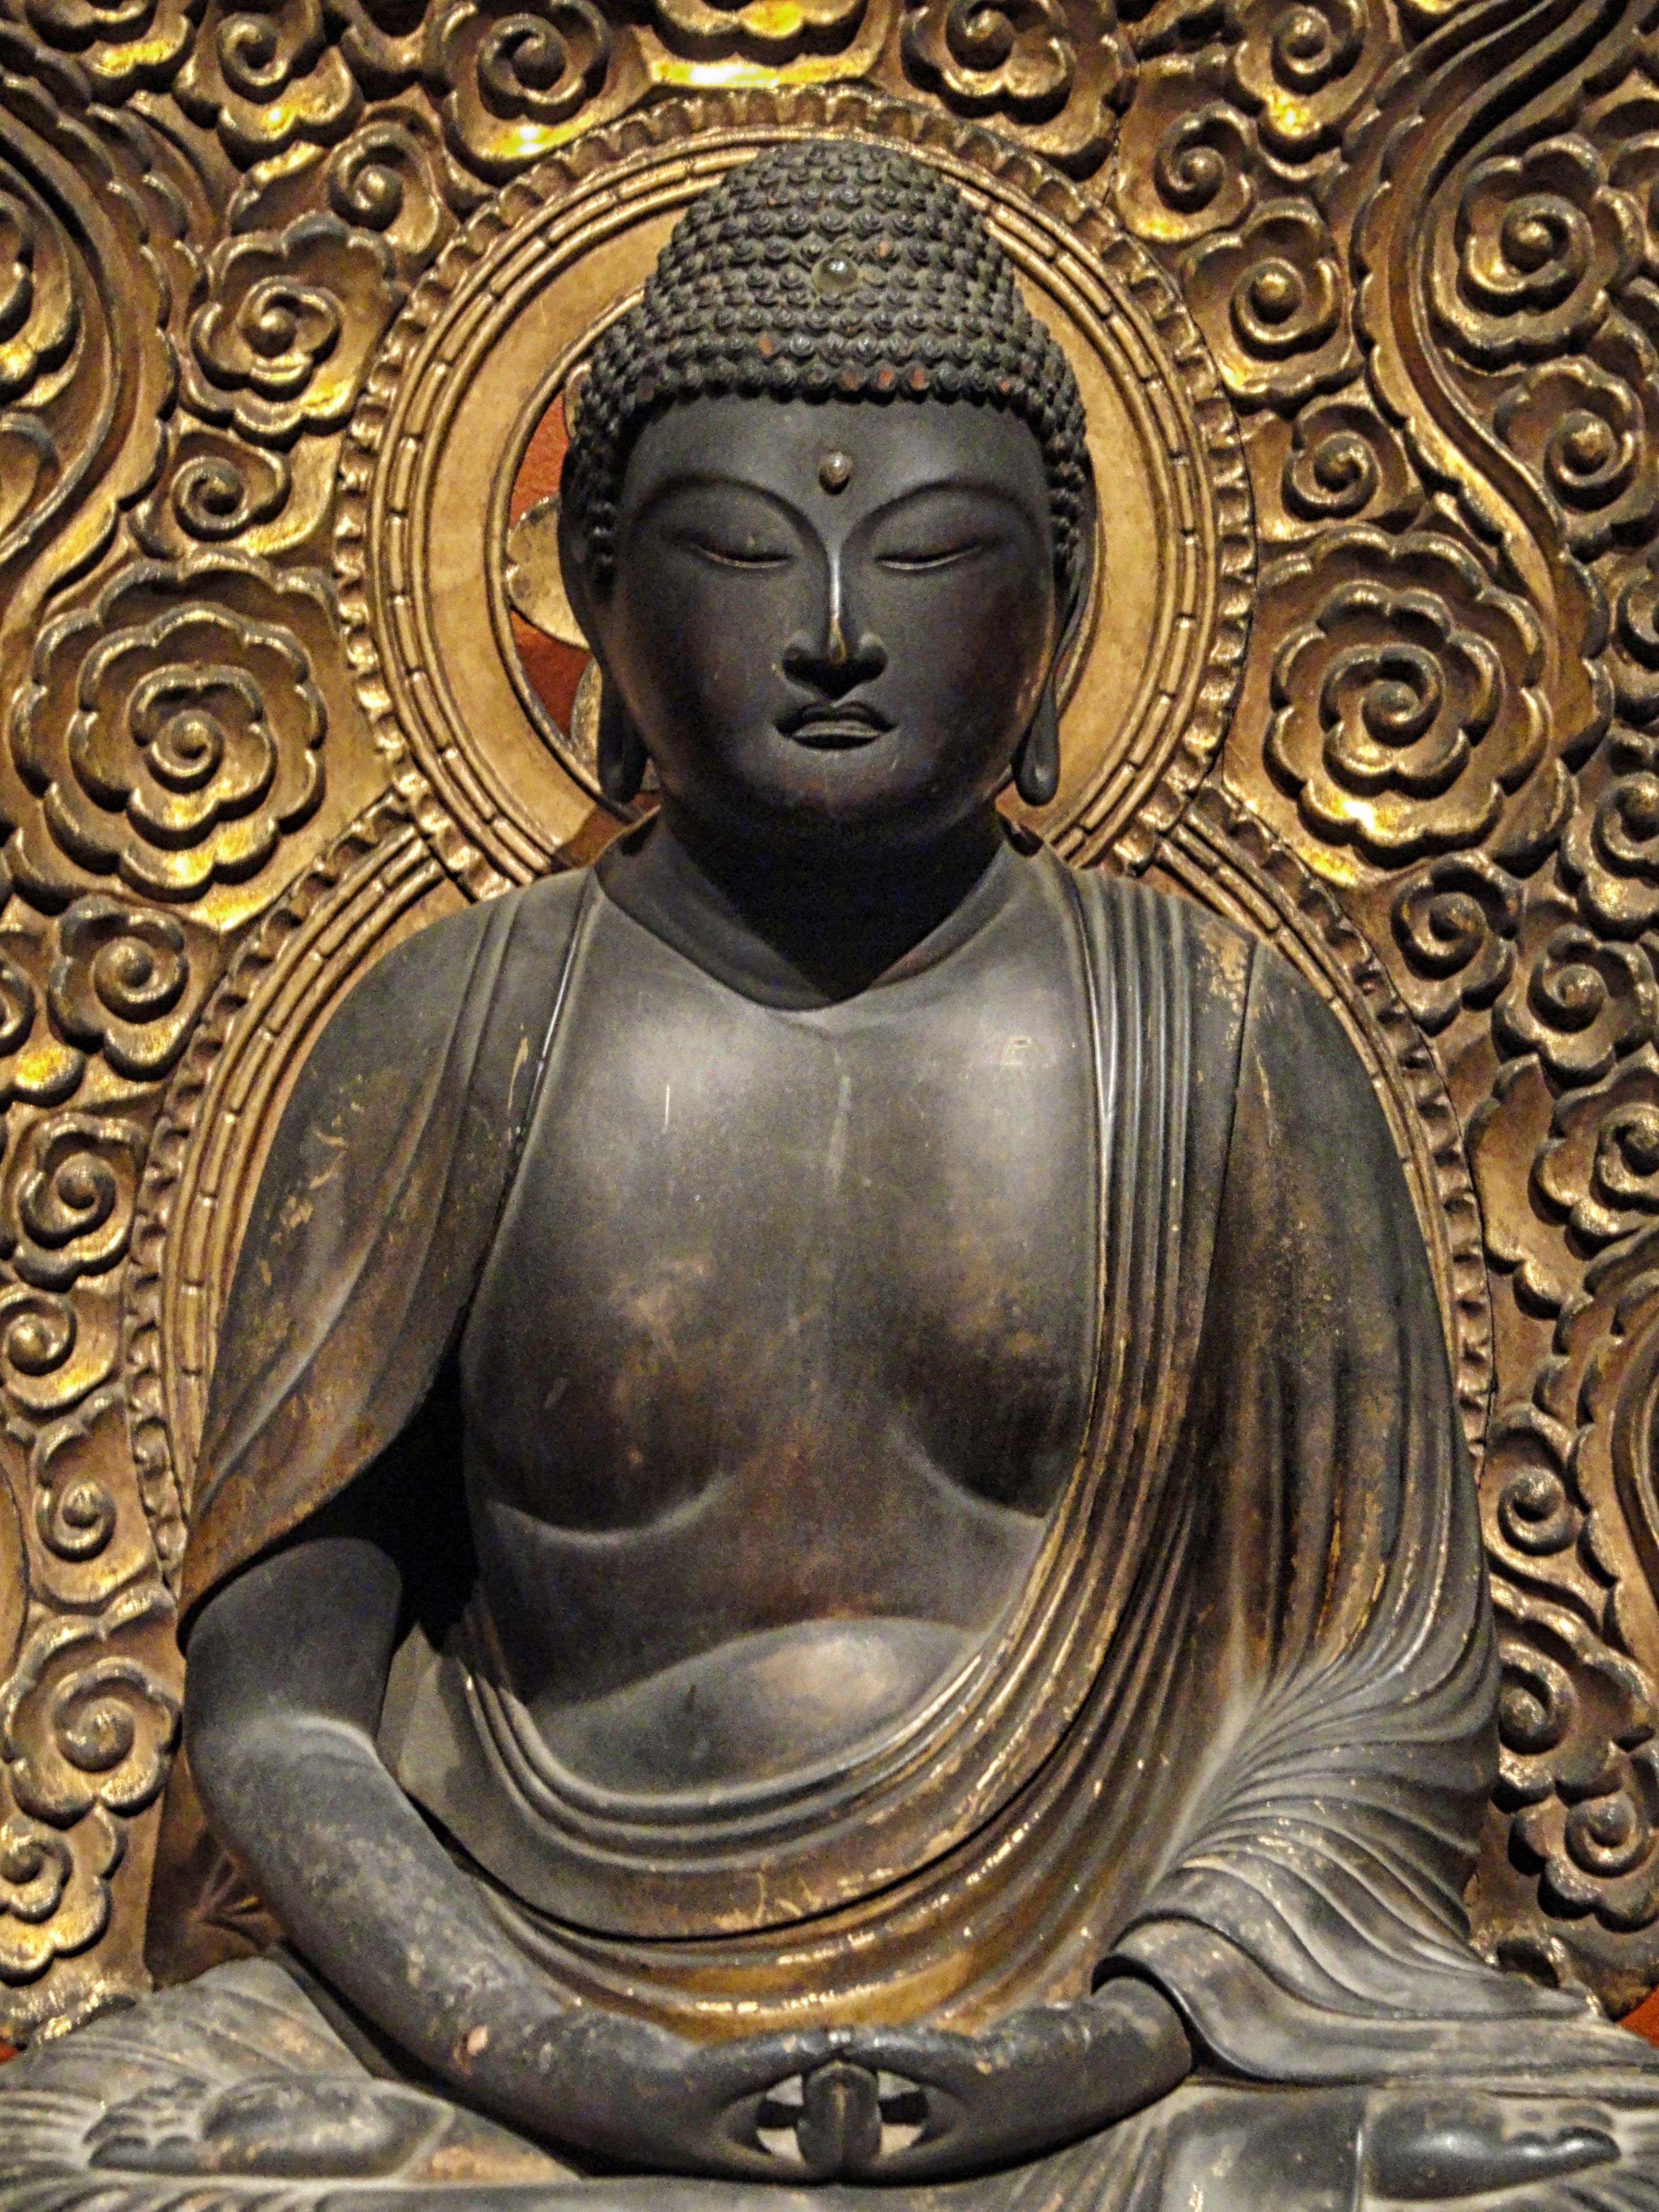 Free images monument statue artistic religion japan